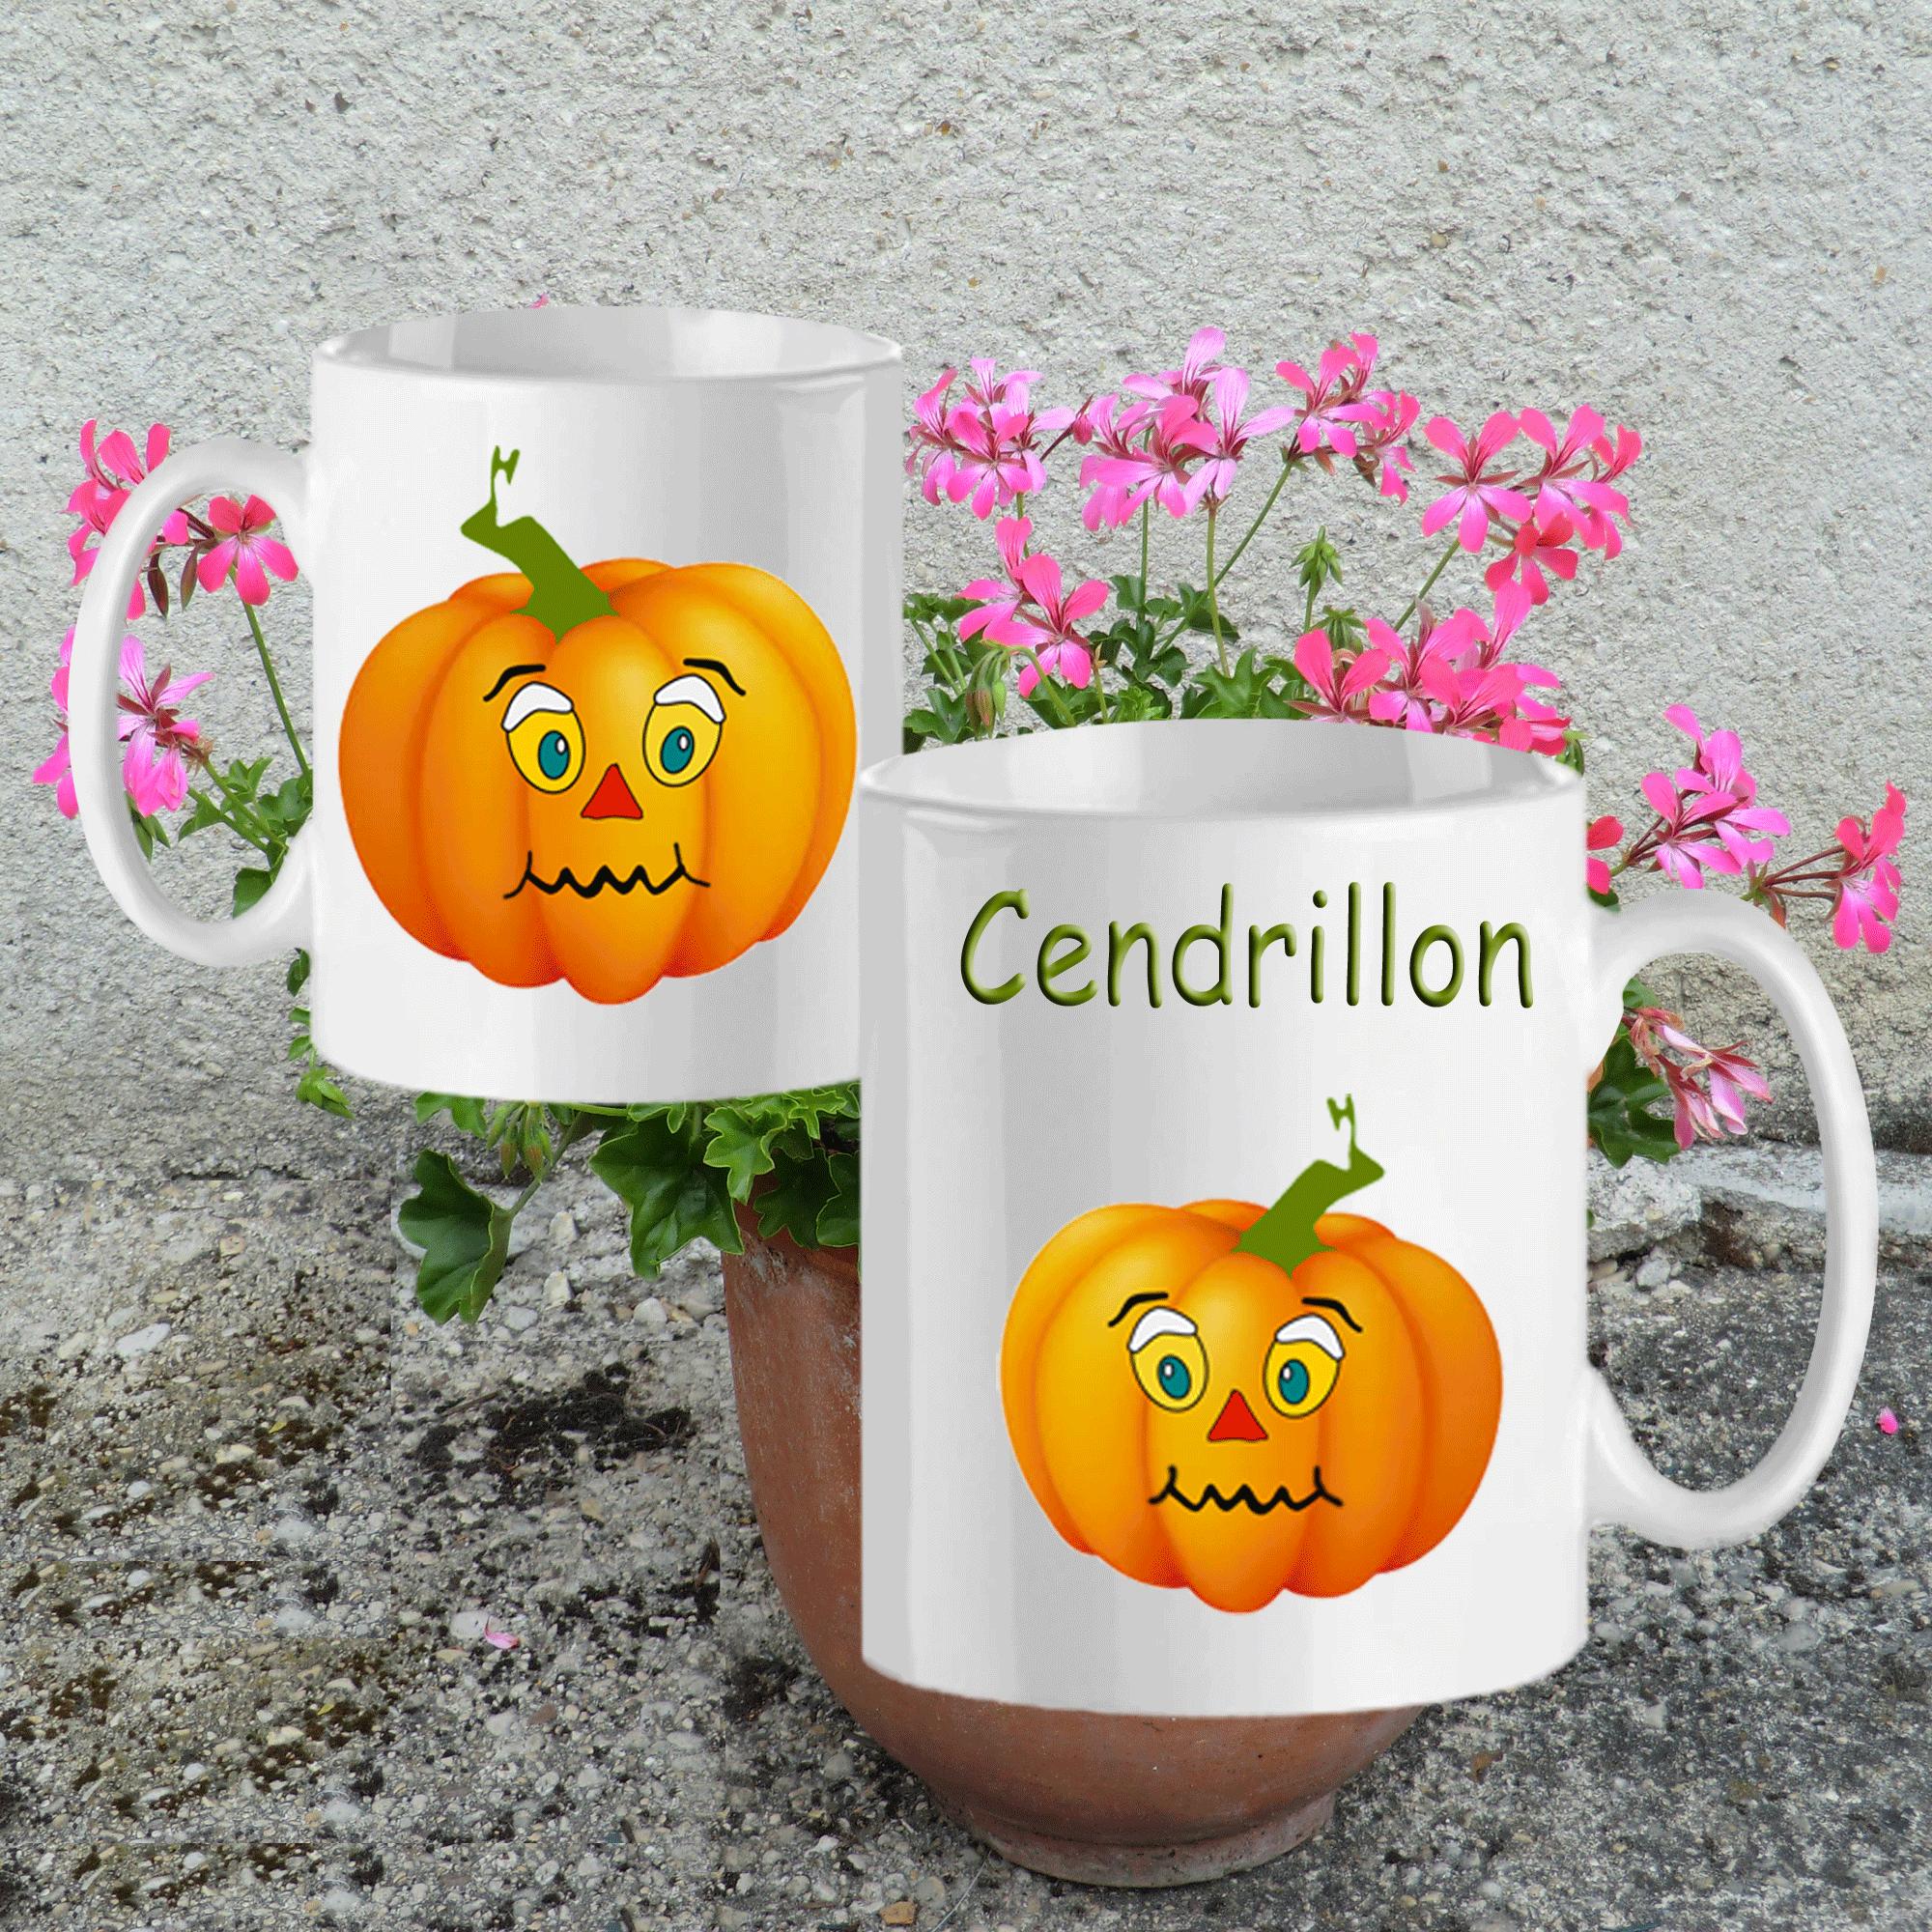 mug-citrouille-potiron-prenom-personnalisable-personnalisation-personnalise-blanc-ceramique-tasse-legende-histoire-conte-fantastique-legume-halloween-cendrillon